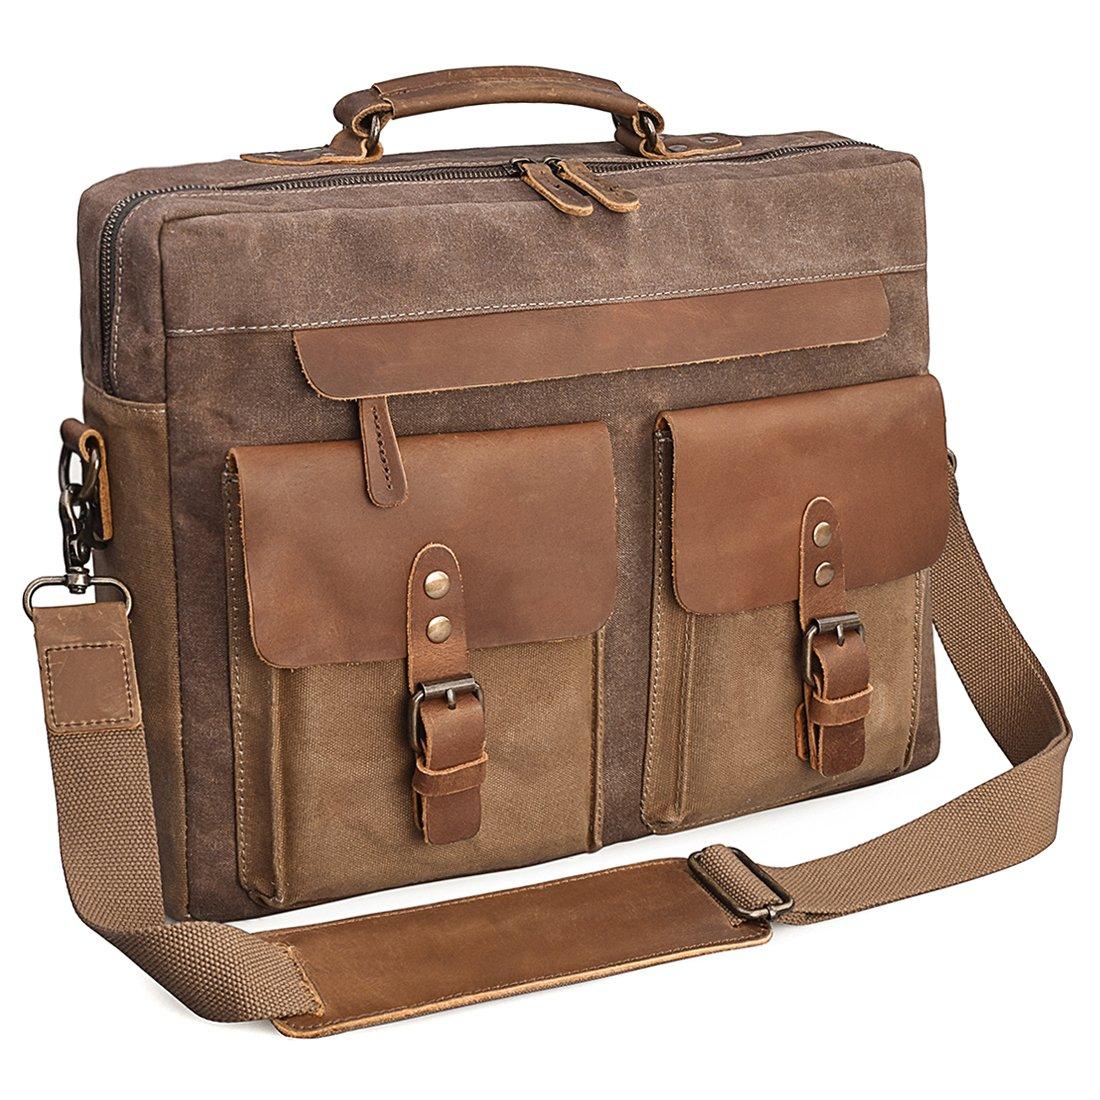 ea15e9da4c NEWHEY Mens Messenger Bag 15.6 Inch Vintage Genuine Leather Briefcase  Waterproof Waxed Canvas Laptop Computer Bag Large Leather Satchel Shoulder  Bag Brown